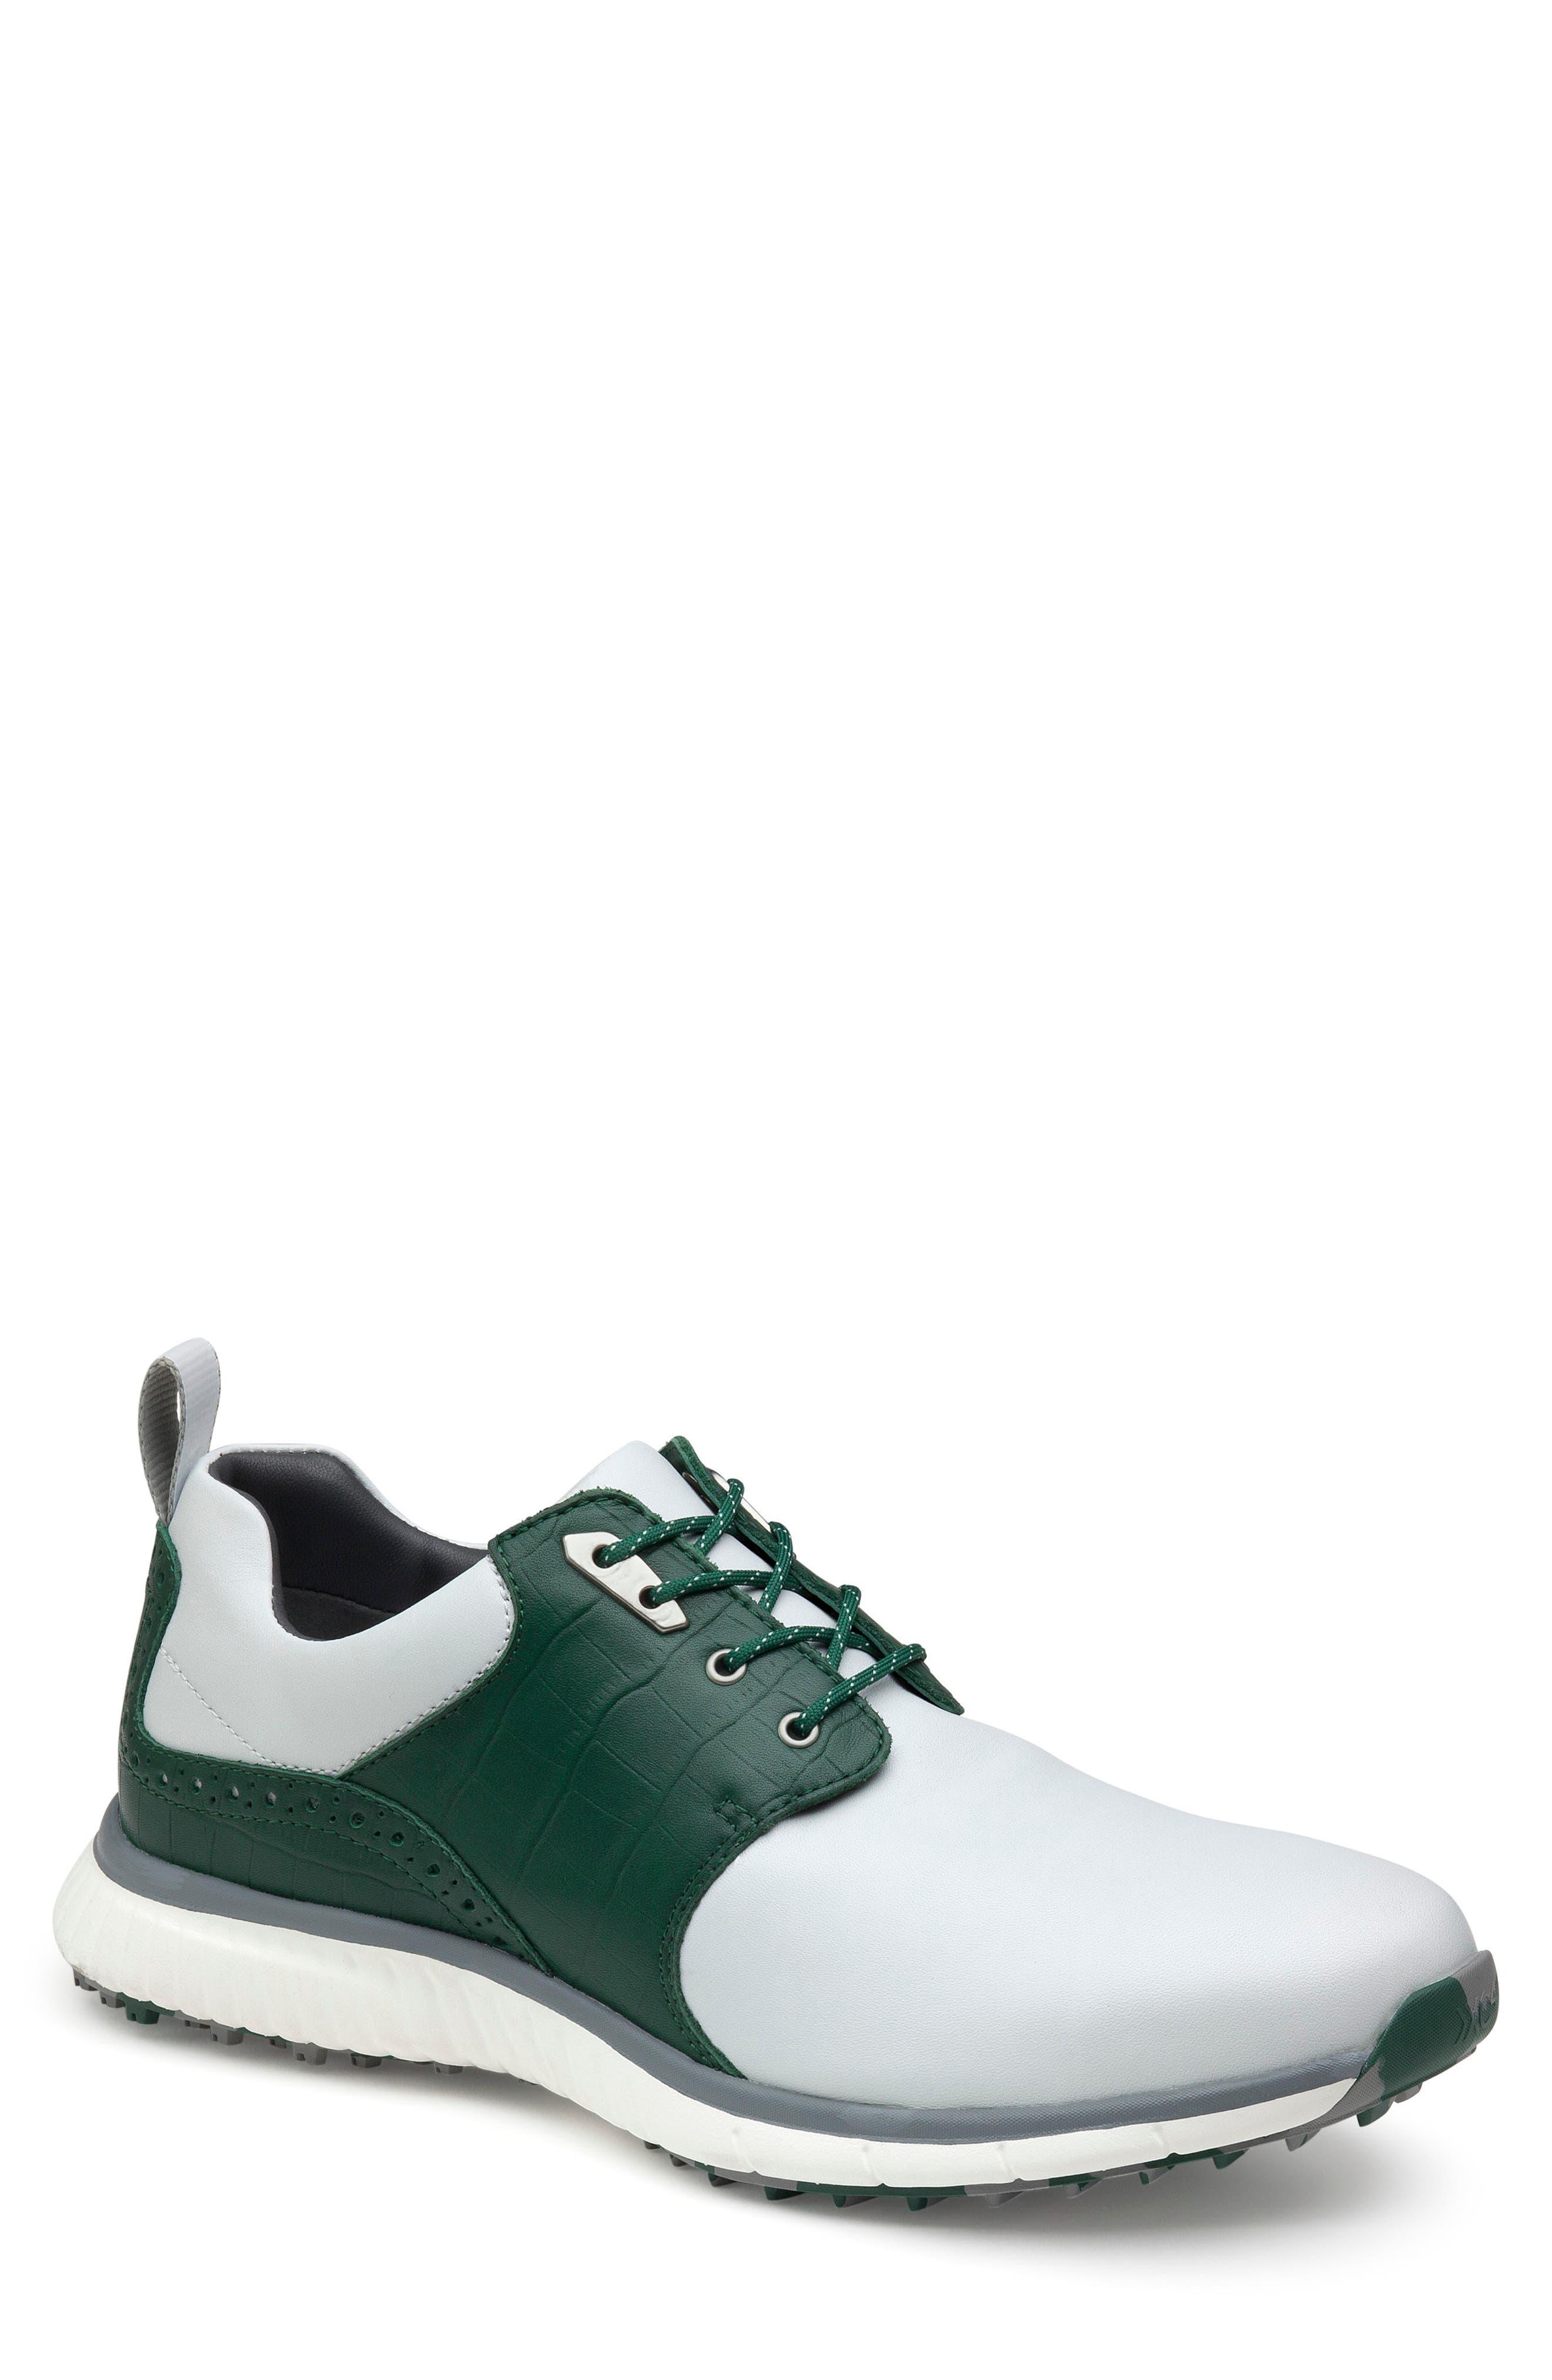 Xc4 H2 Luxe Hybrid Waterproof Golf Saddle Sneaker